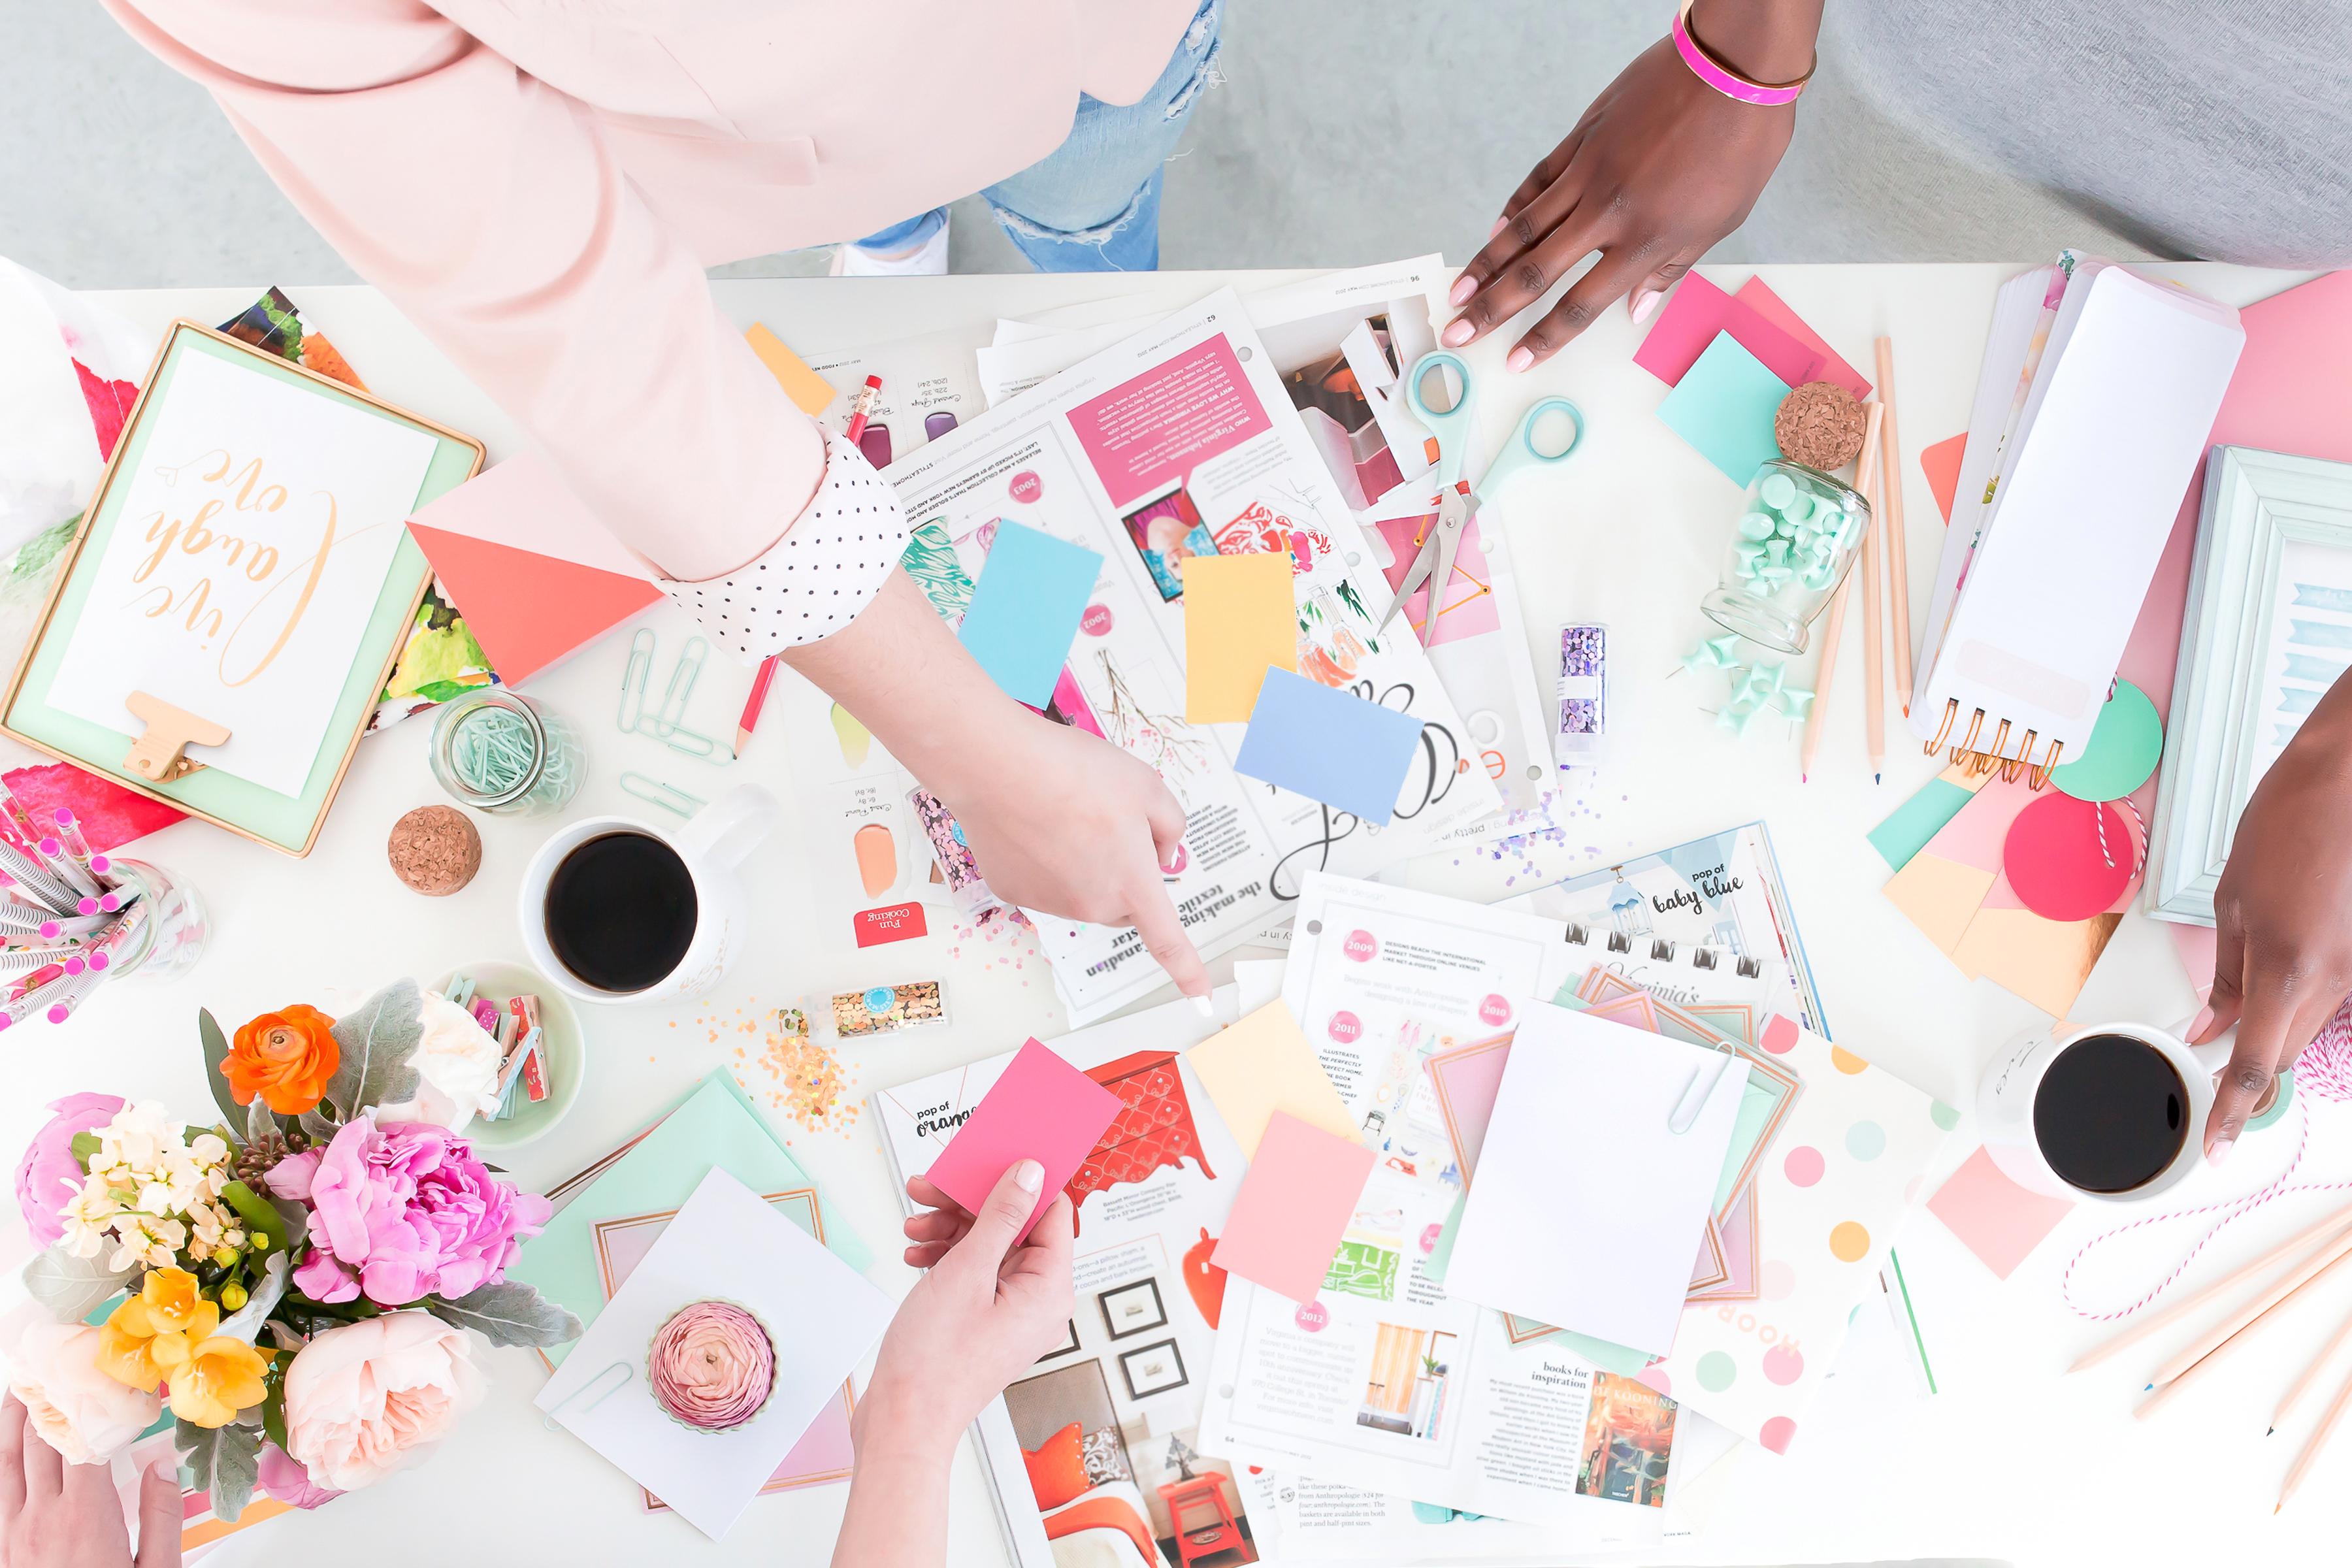 Kreativität, kreativ, Schule und Kreativität